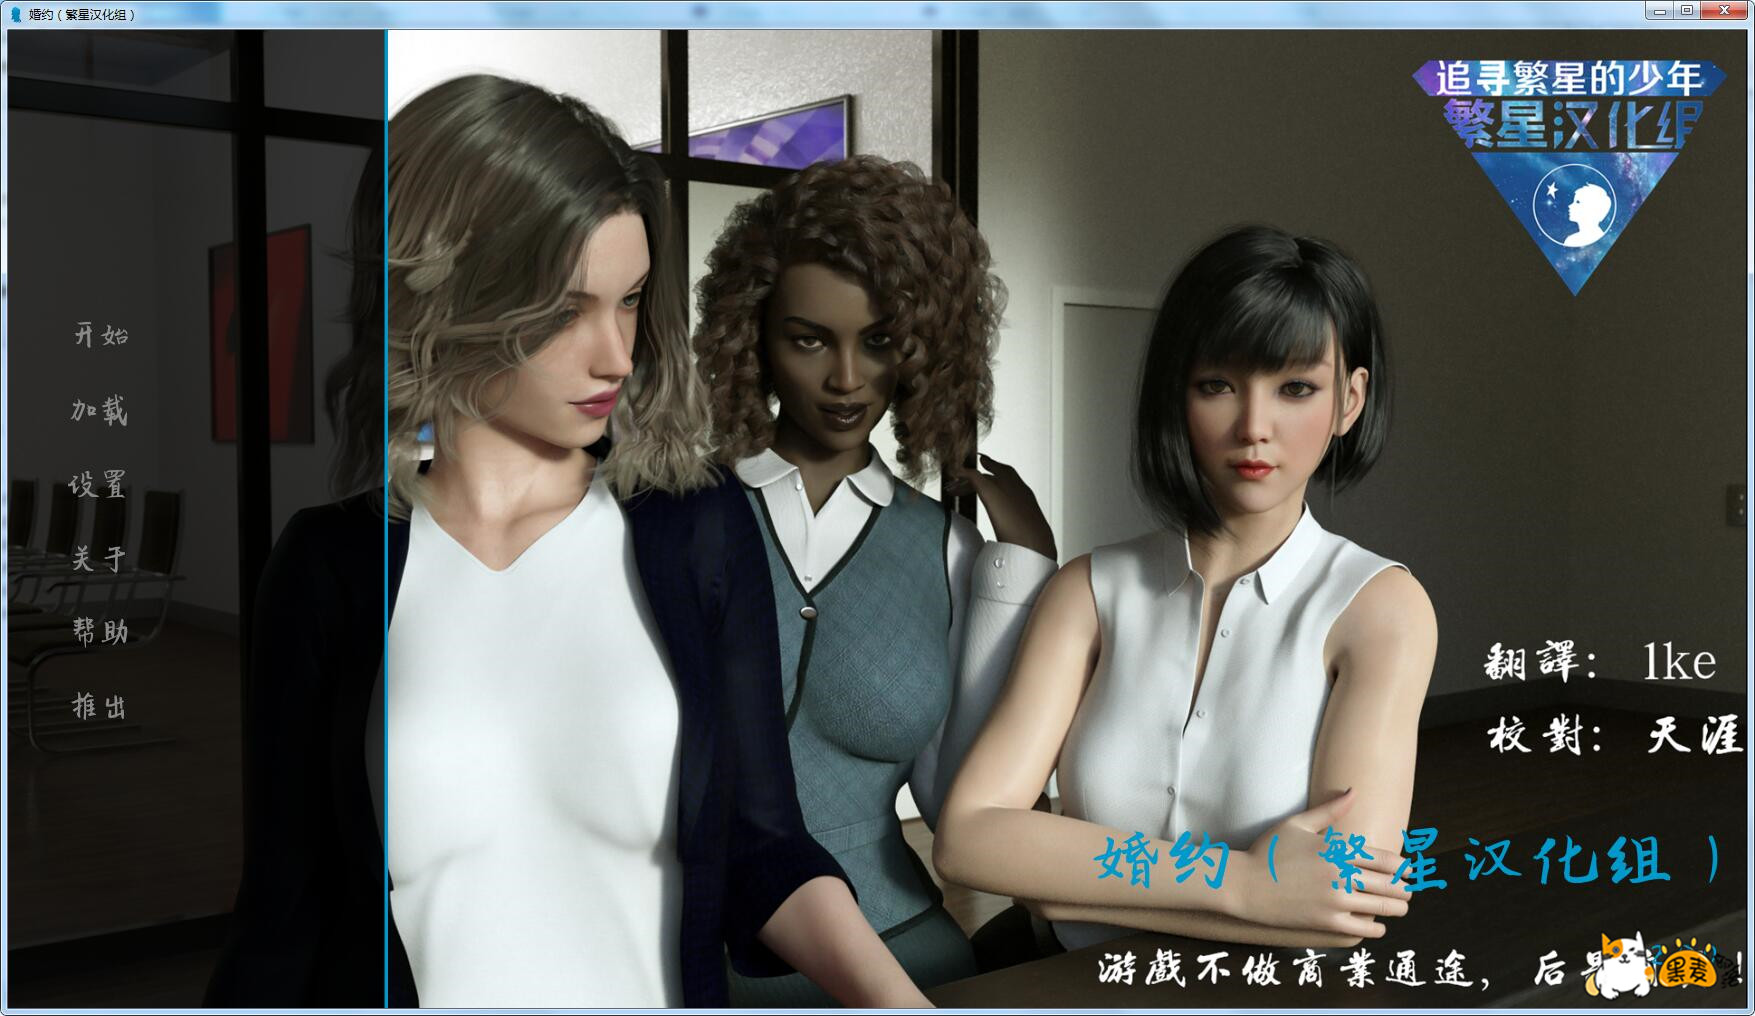 【欧美SLG/汉化/动态CG】婚约 The Engagement v2.0.0 汉化版+中文攻略【更新】【1G】